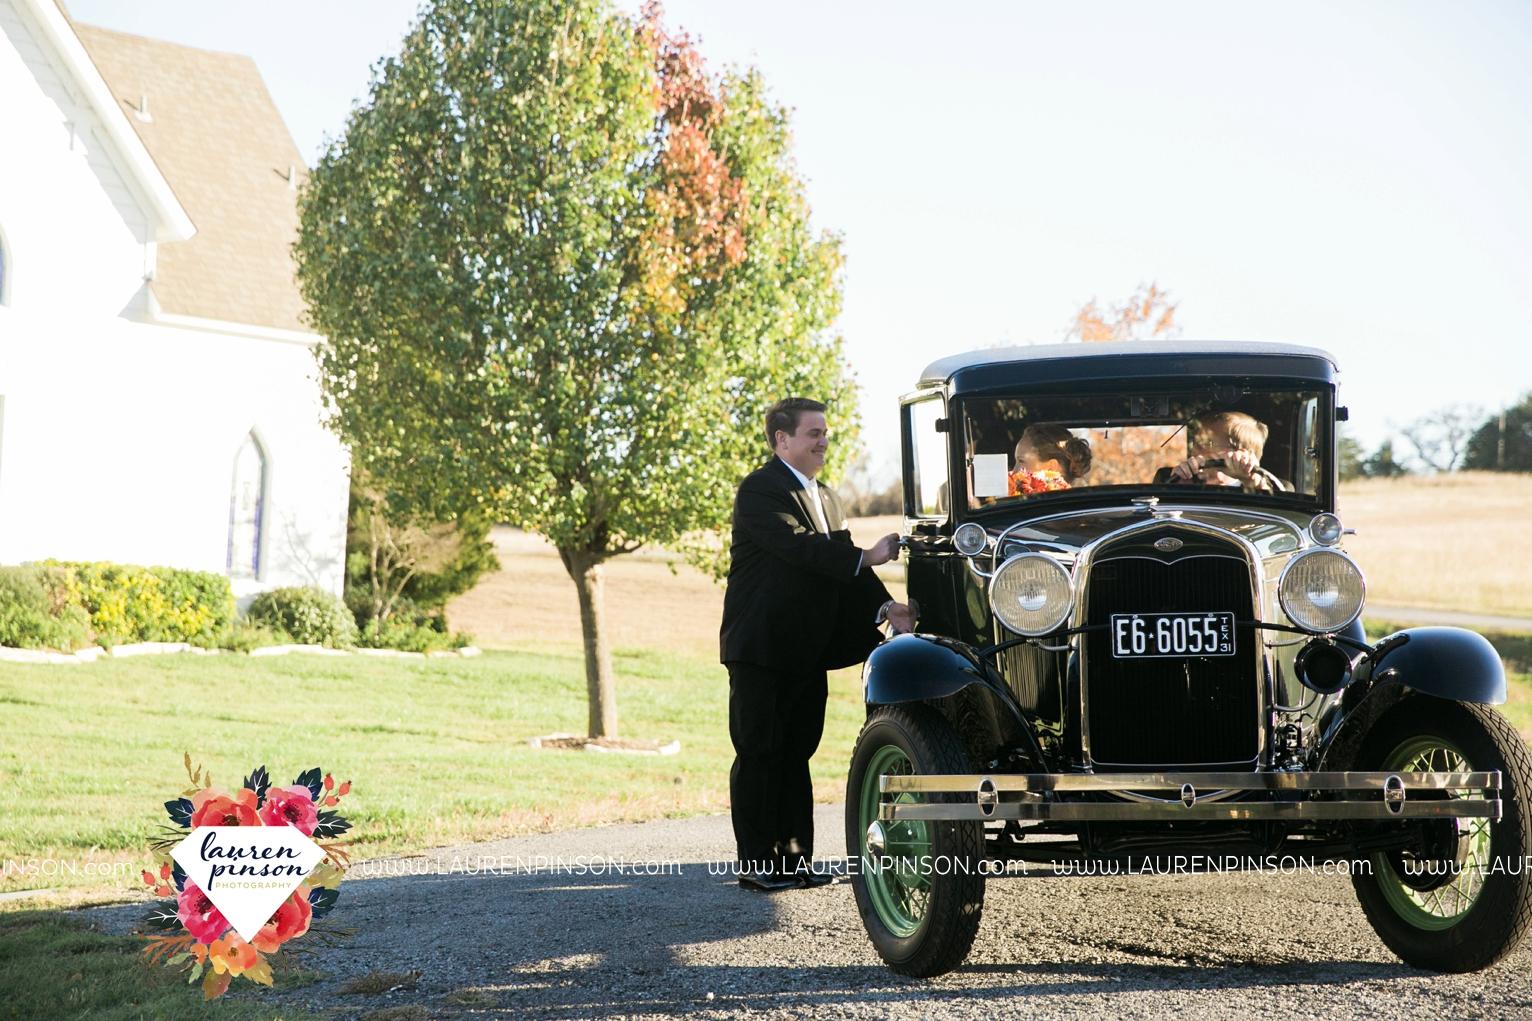 bells-texas-wedding-photography-at-willowood-ranch-chapel-north-texas-wichita-falls-wedding-photographer_1824.jpg